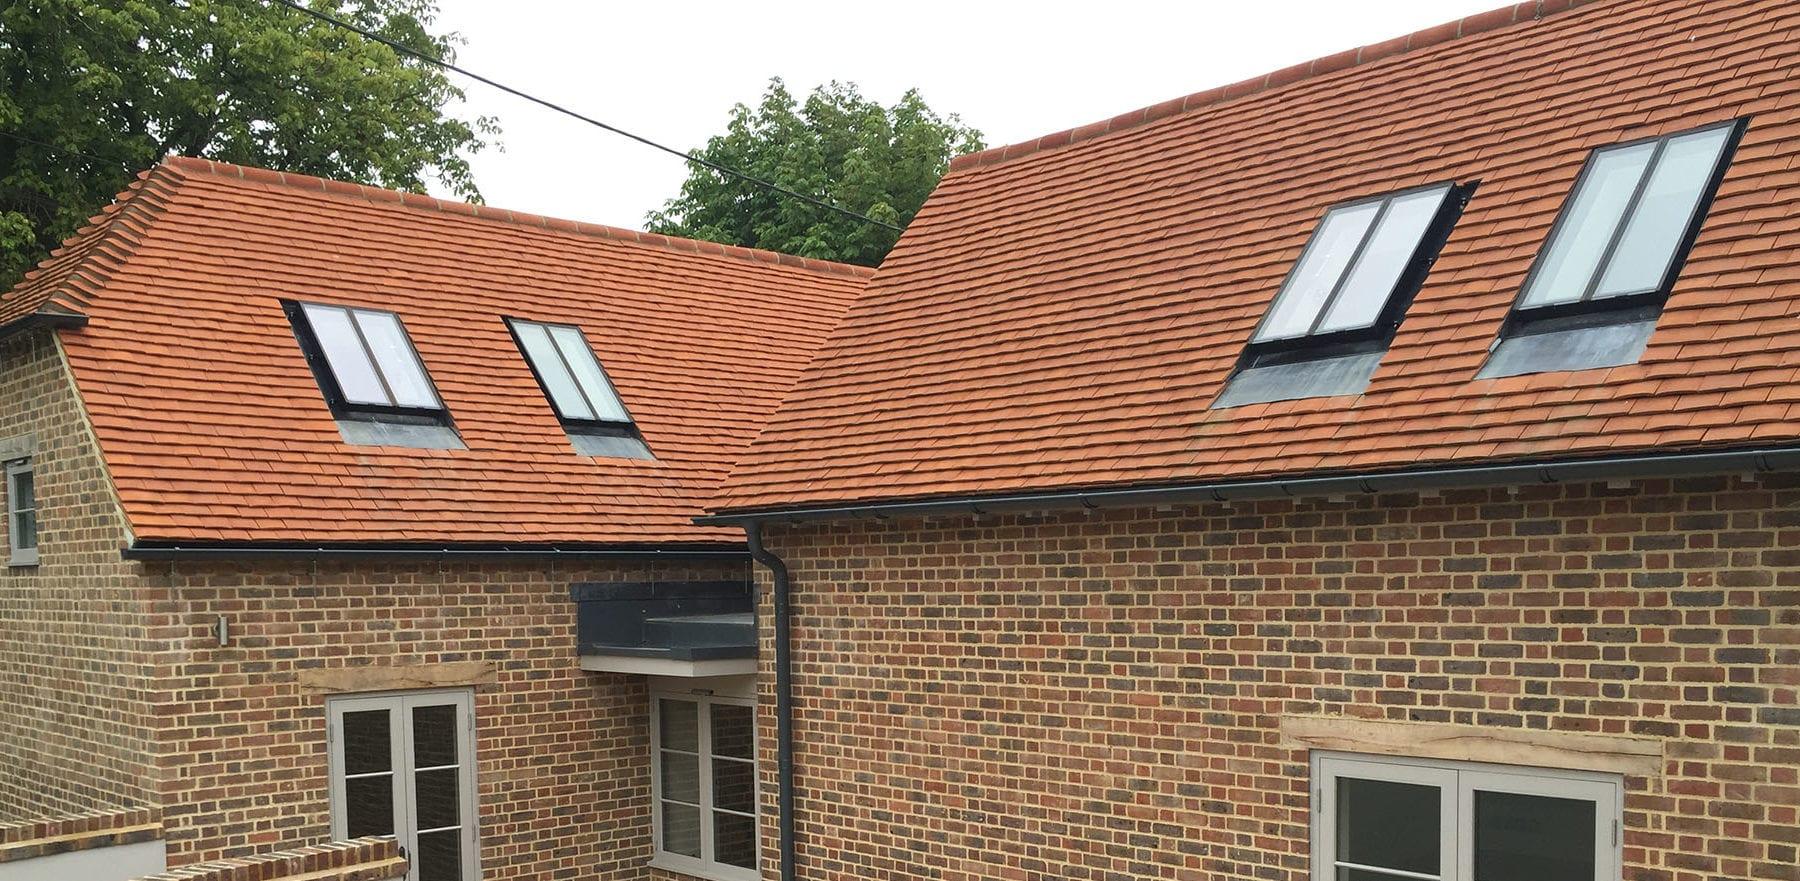 Lifestiles - Handcrafted Orange Clay Roof Tiles - Aston, England 3